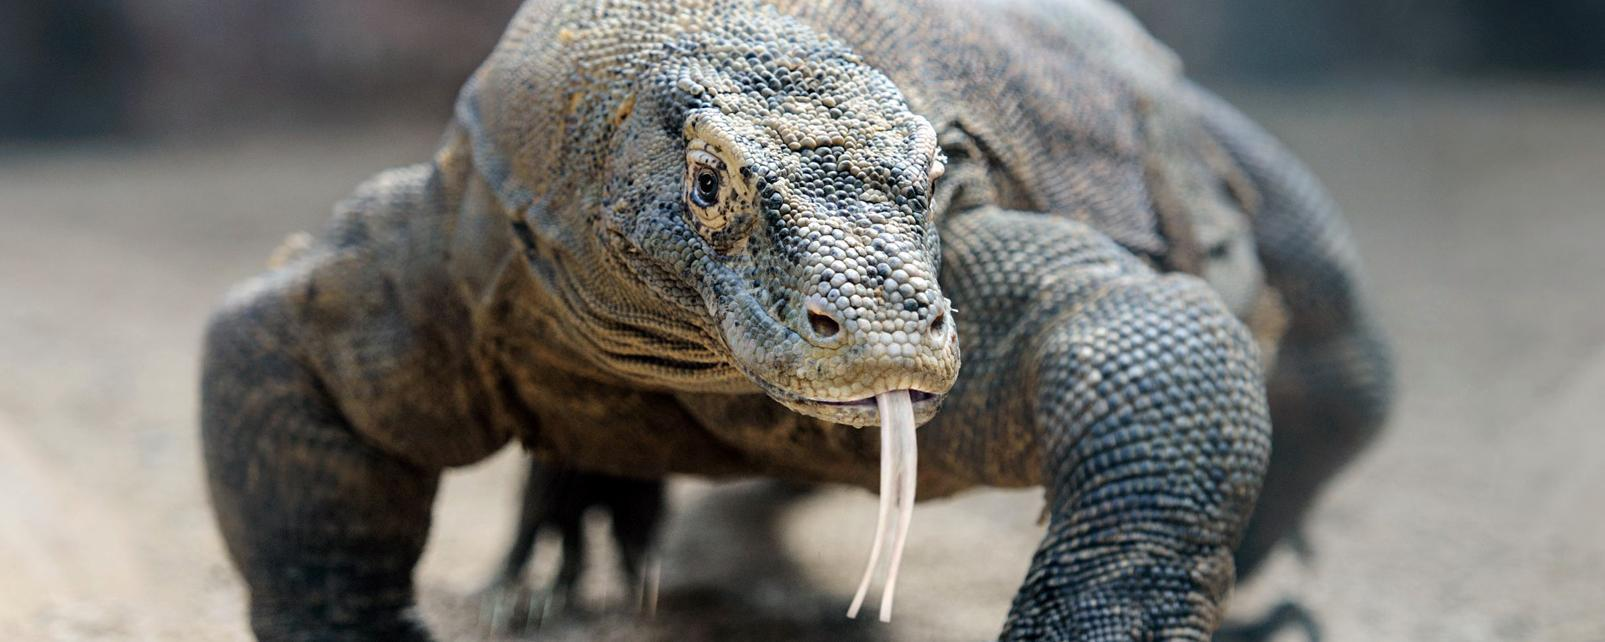 Asie, Indonésie, dragon de Komodo, dragon, Komodo,